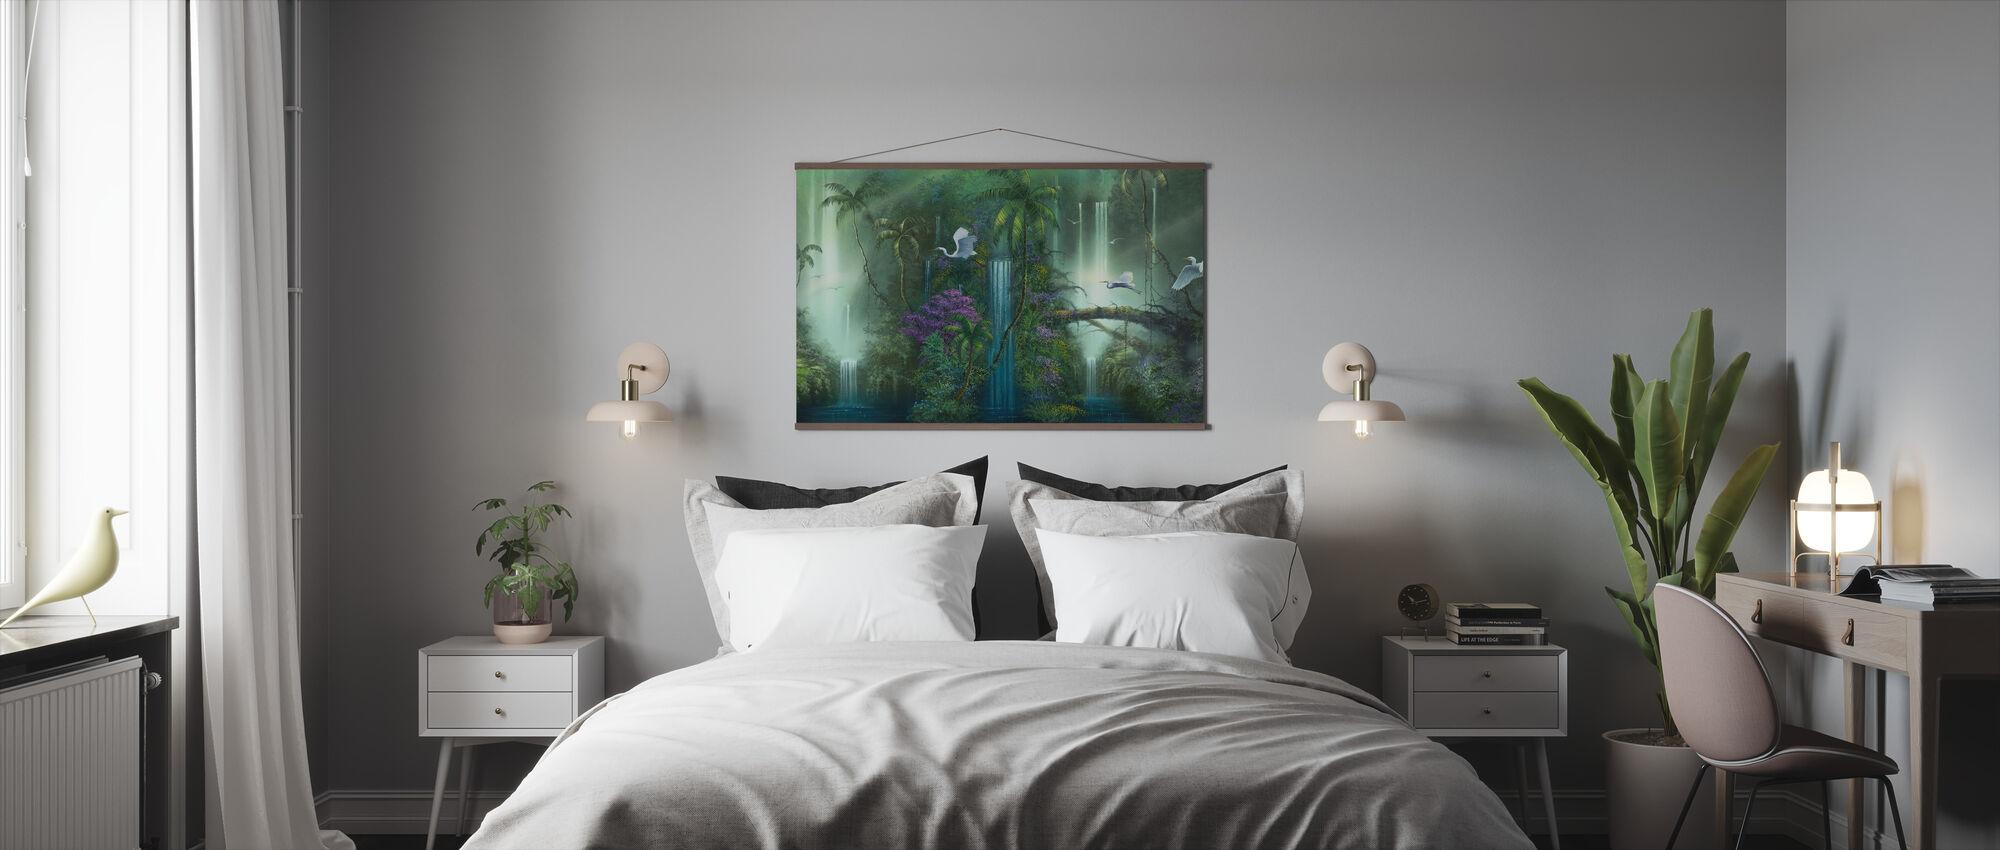 Vesiputous fantasia - Juliste - Makuuhuone